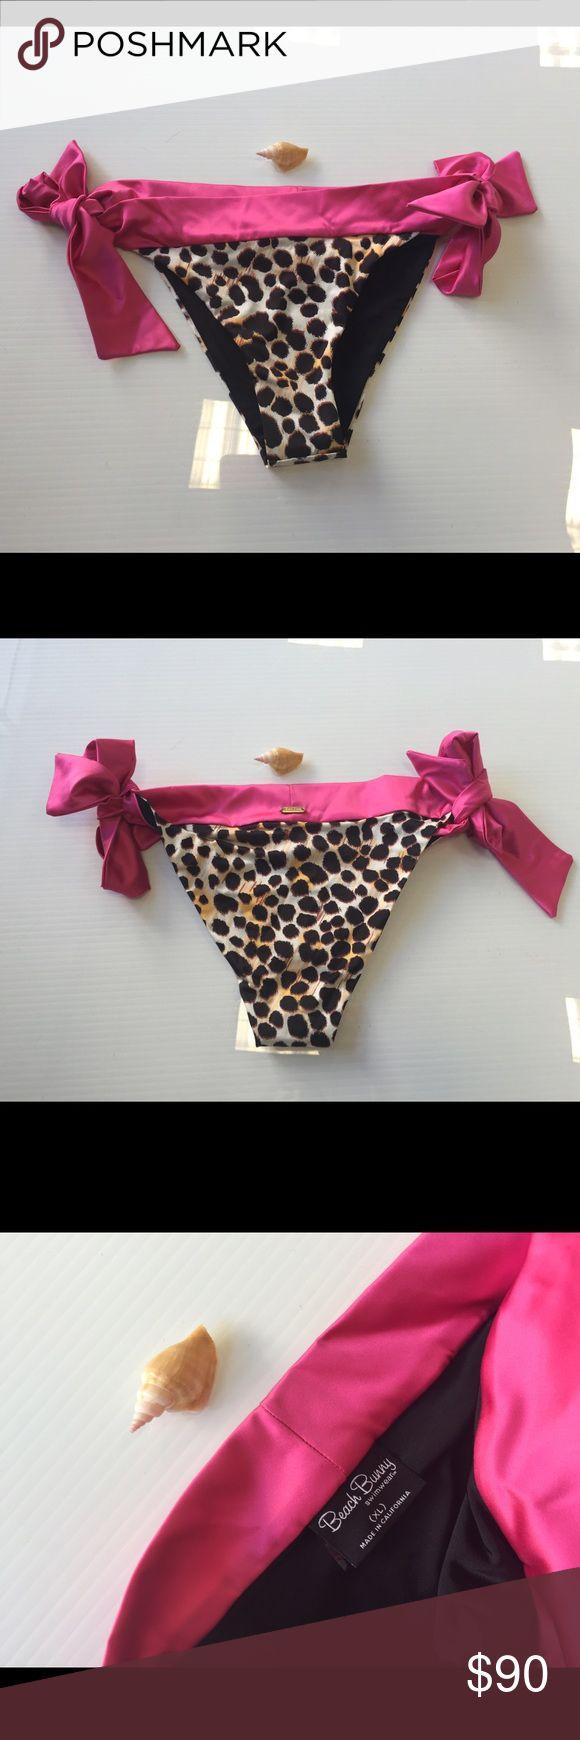 Beach bunny Cheetahlicious bikini bottoms XL new Beach bunny Cheetahlicious bikini bottoms XL new without tags Beach Bunny Swim Bikinis